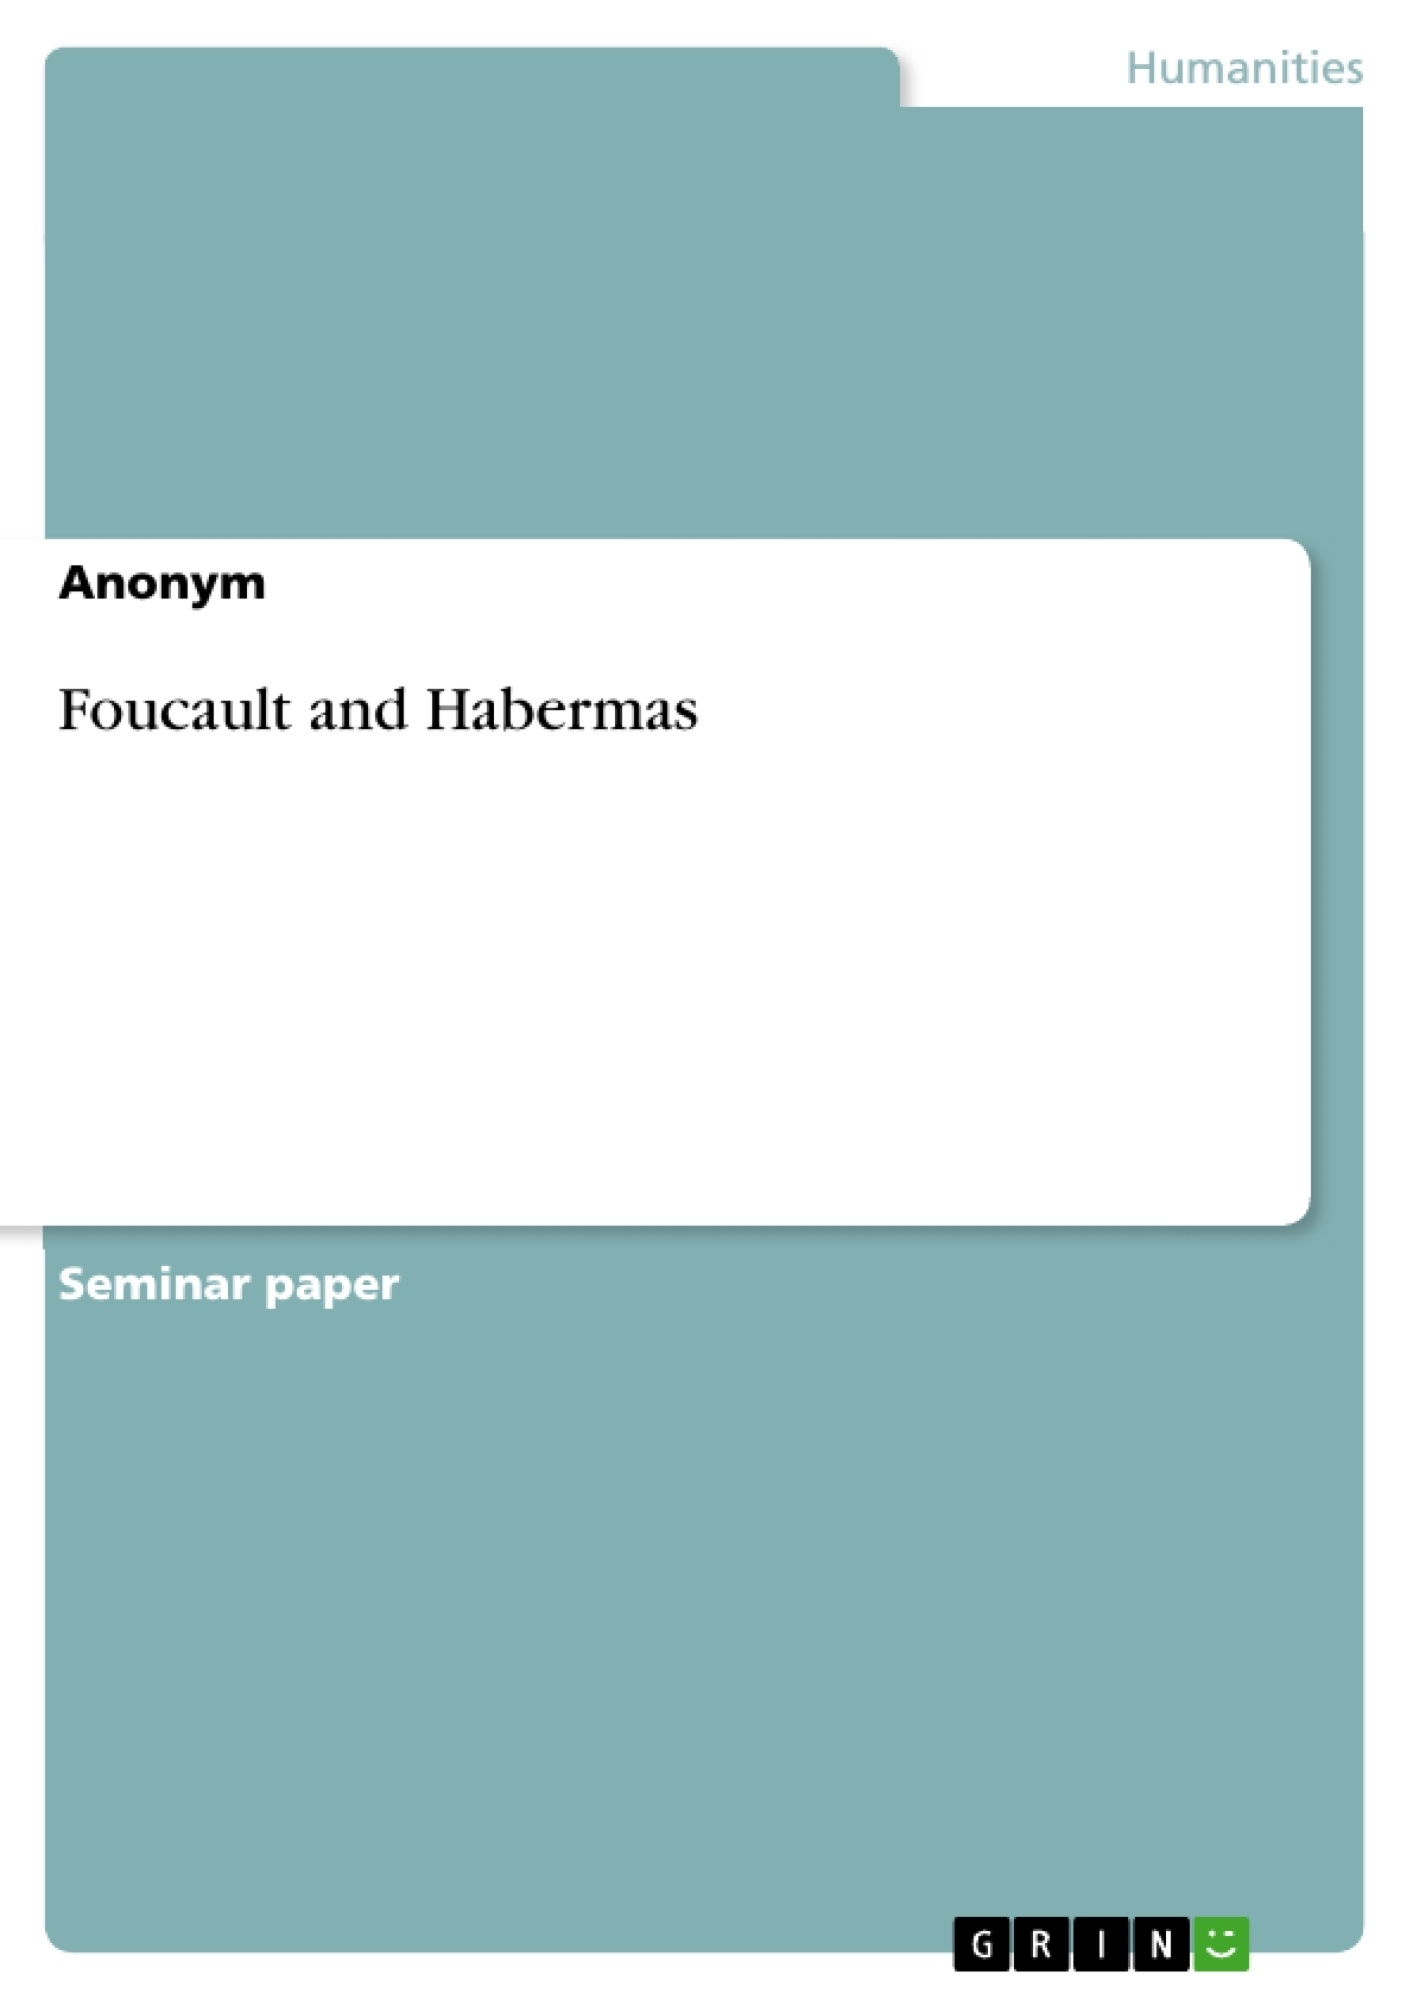 Title: Foucault and Habermas